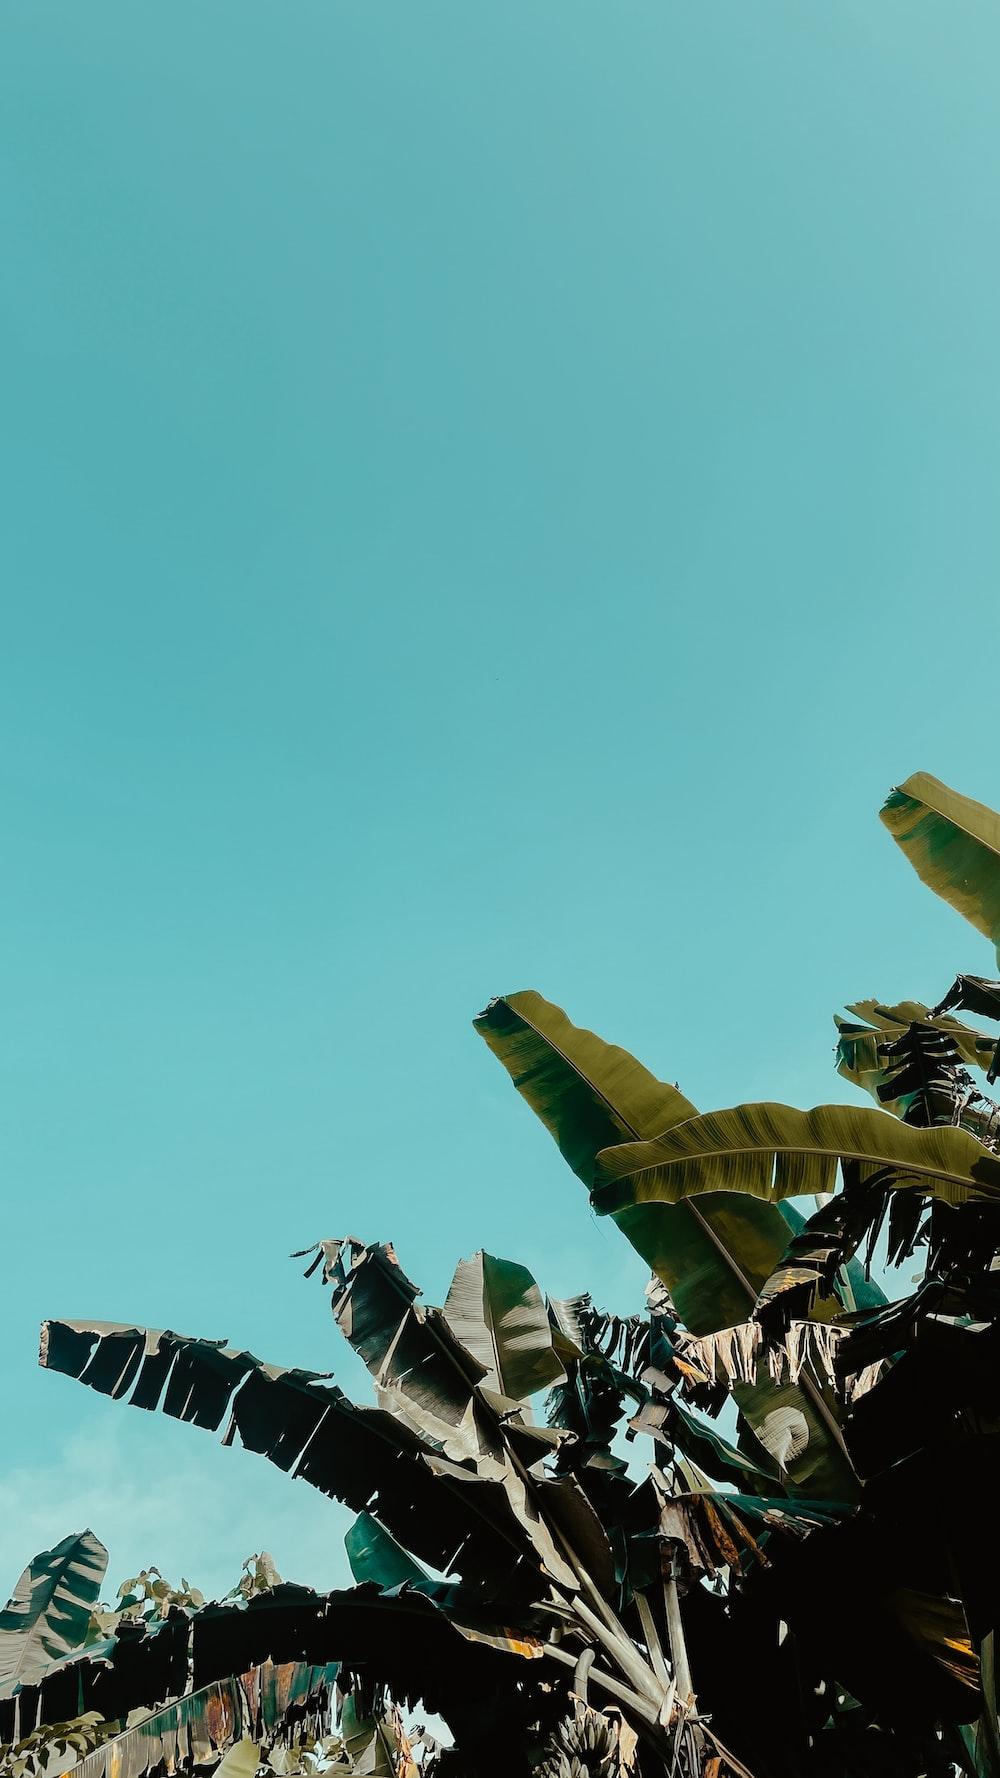 green banana tree under blue sky during daytime